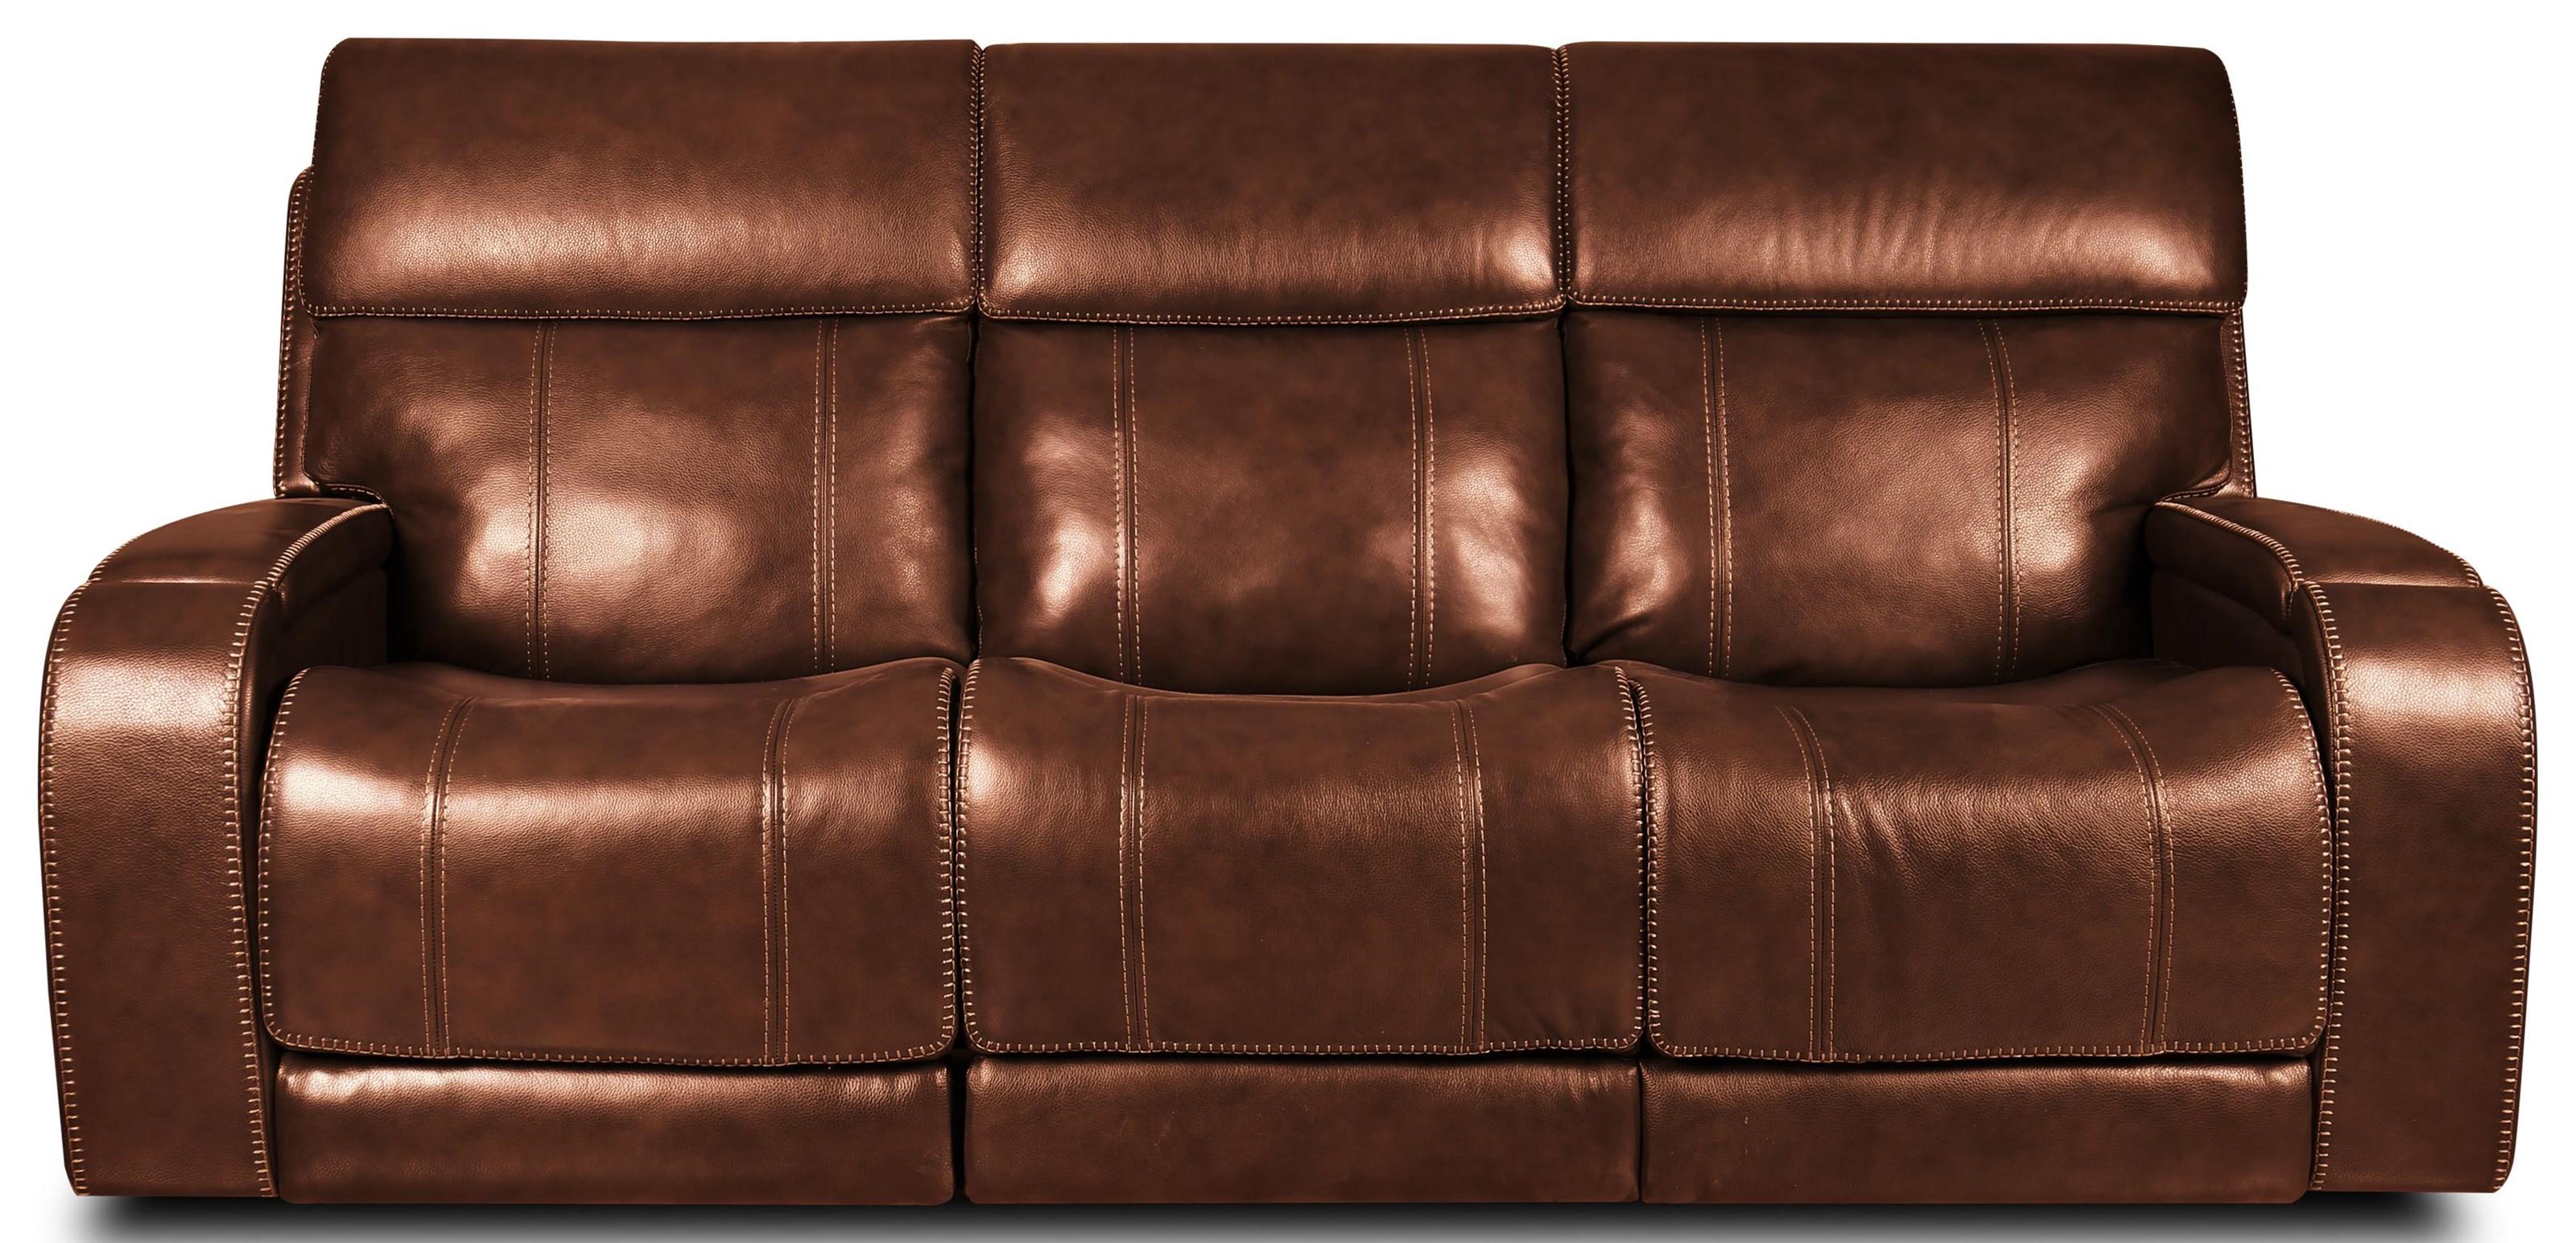 462 Sofa Triple Power Leather Reclining Sofa by Moto Motion at Furniture Fair - North Carolina